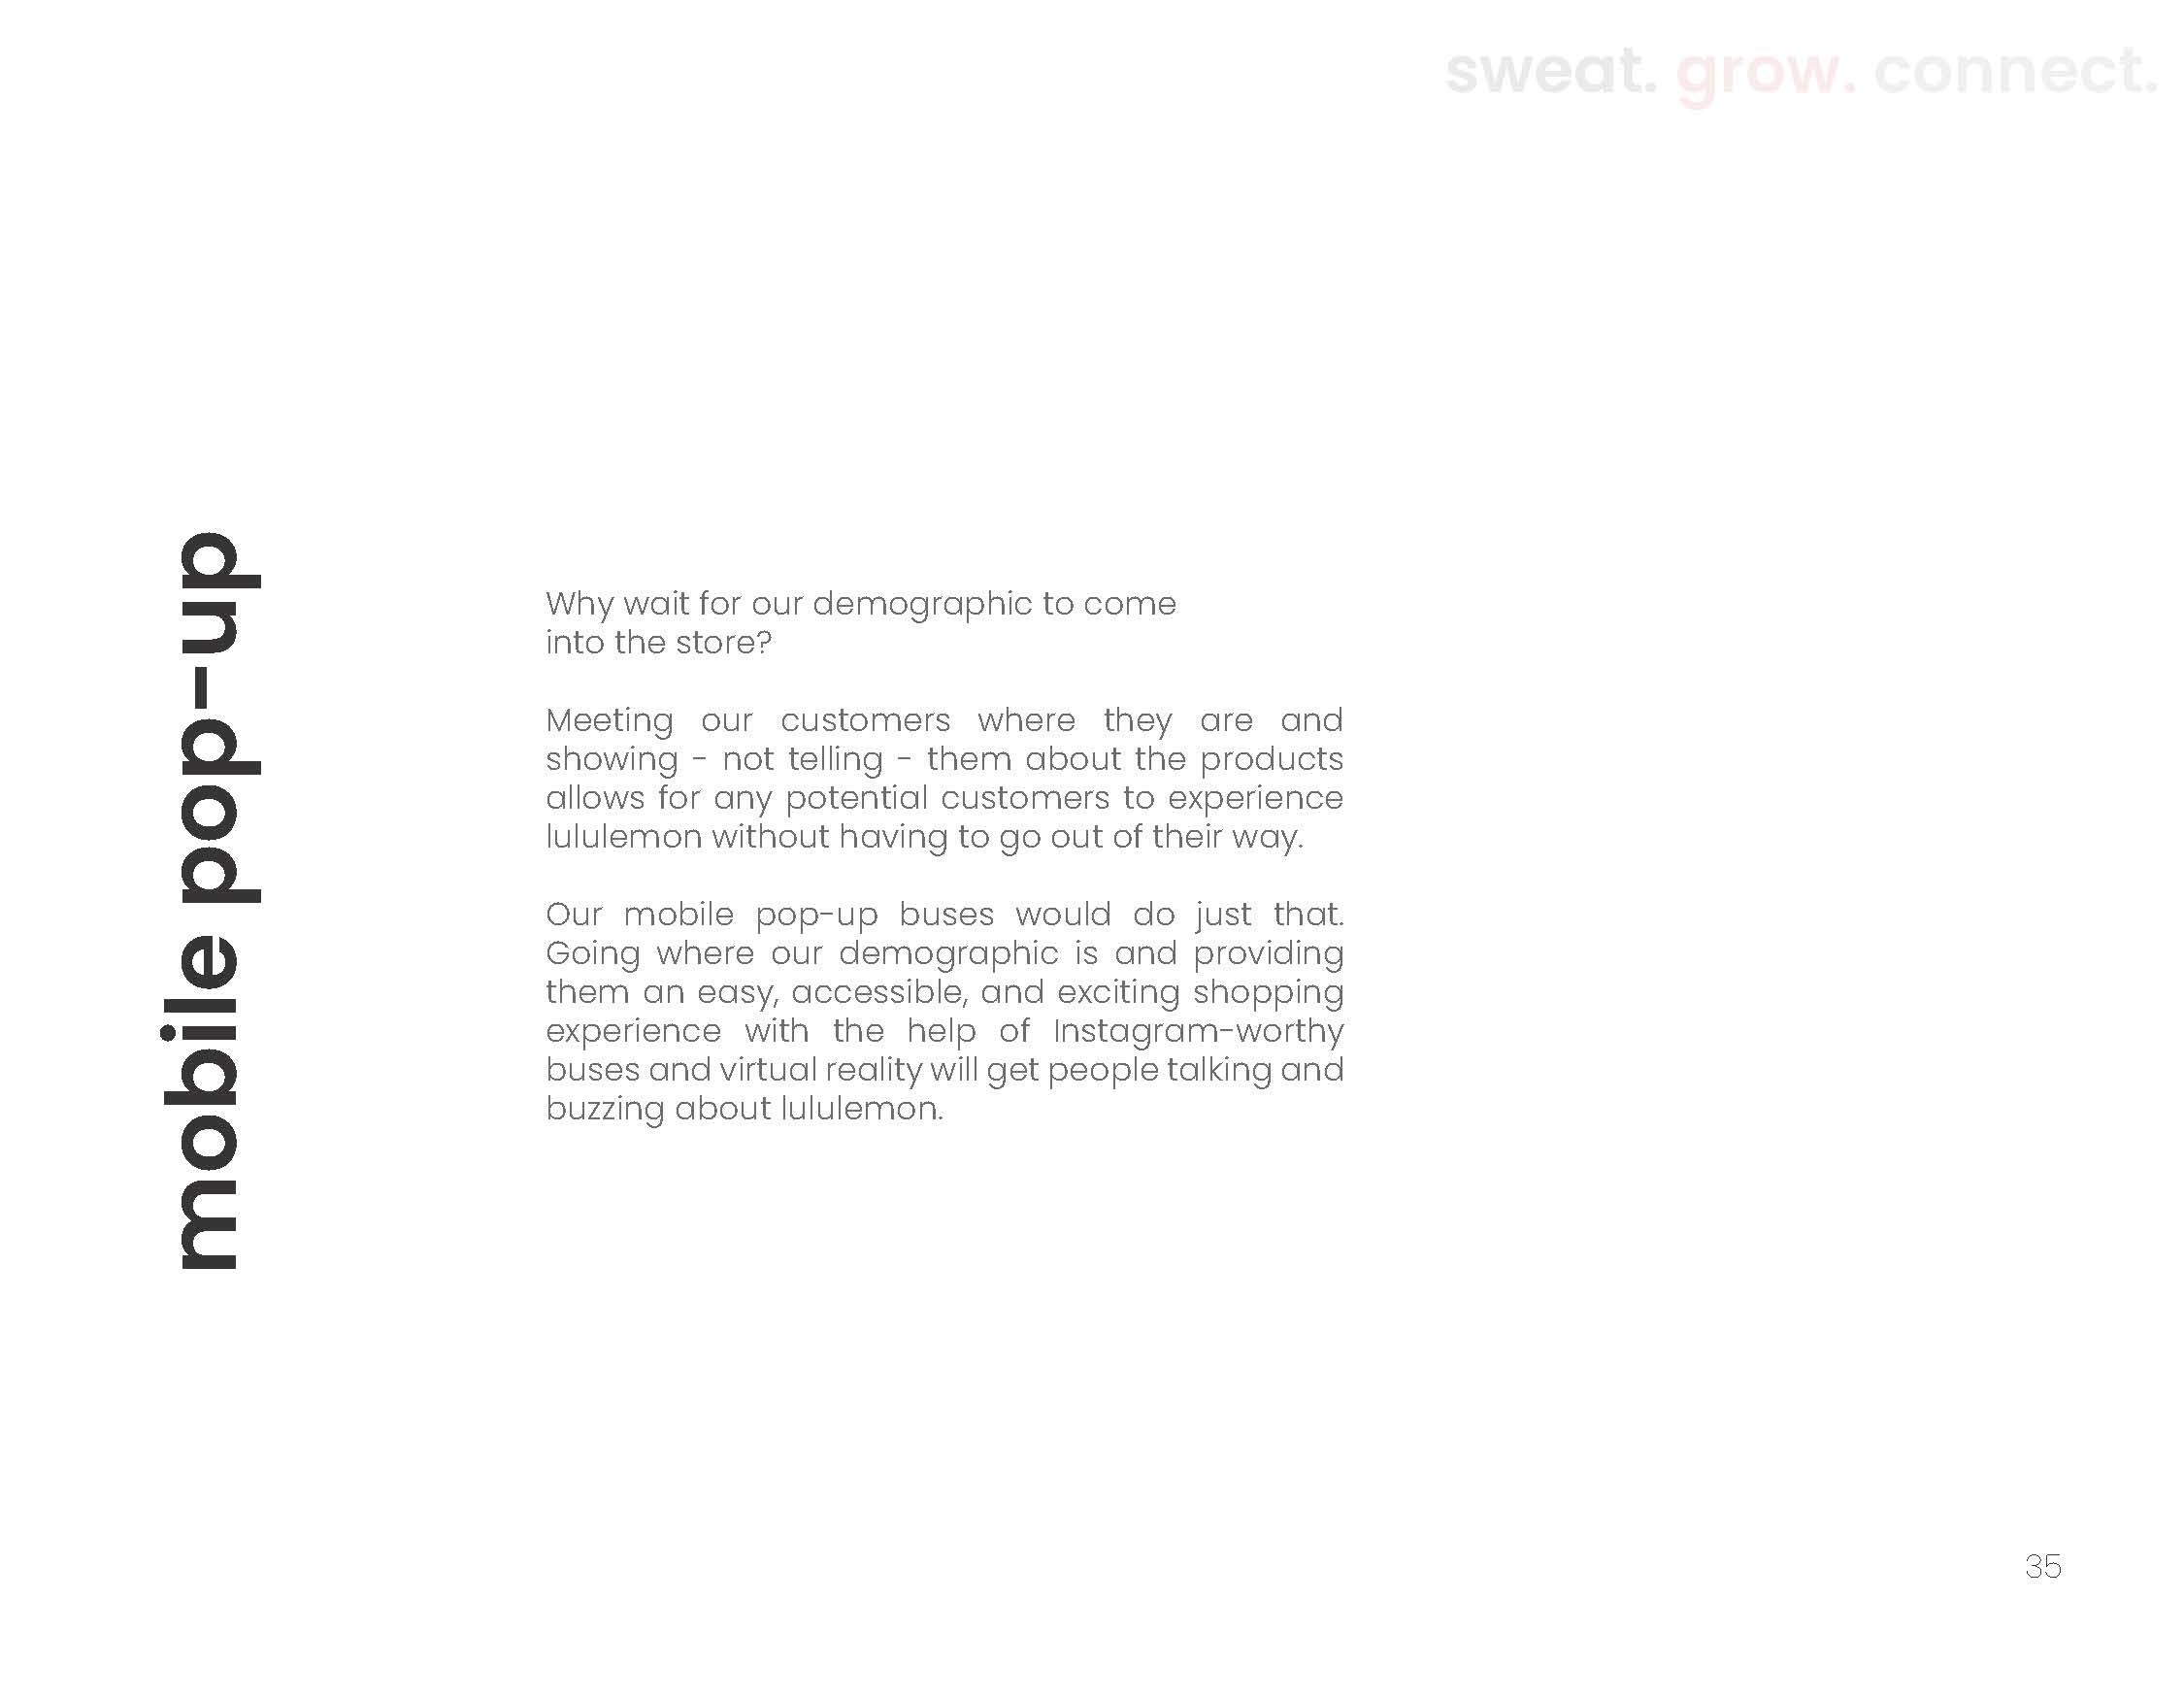 Nellah_FinalPitchBook_Portfolio_lululemon_Page_35.jpg